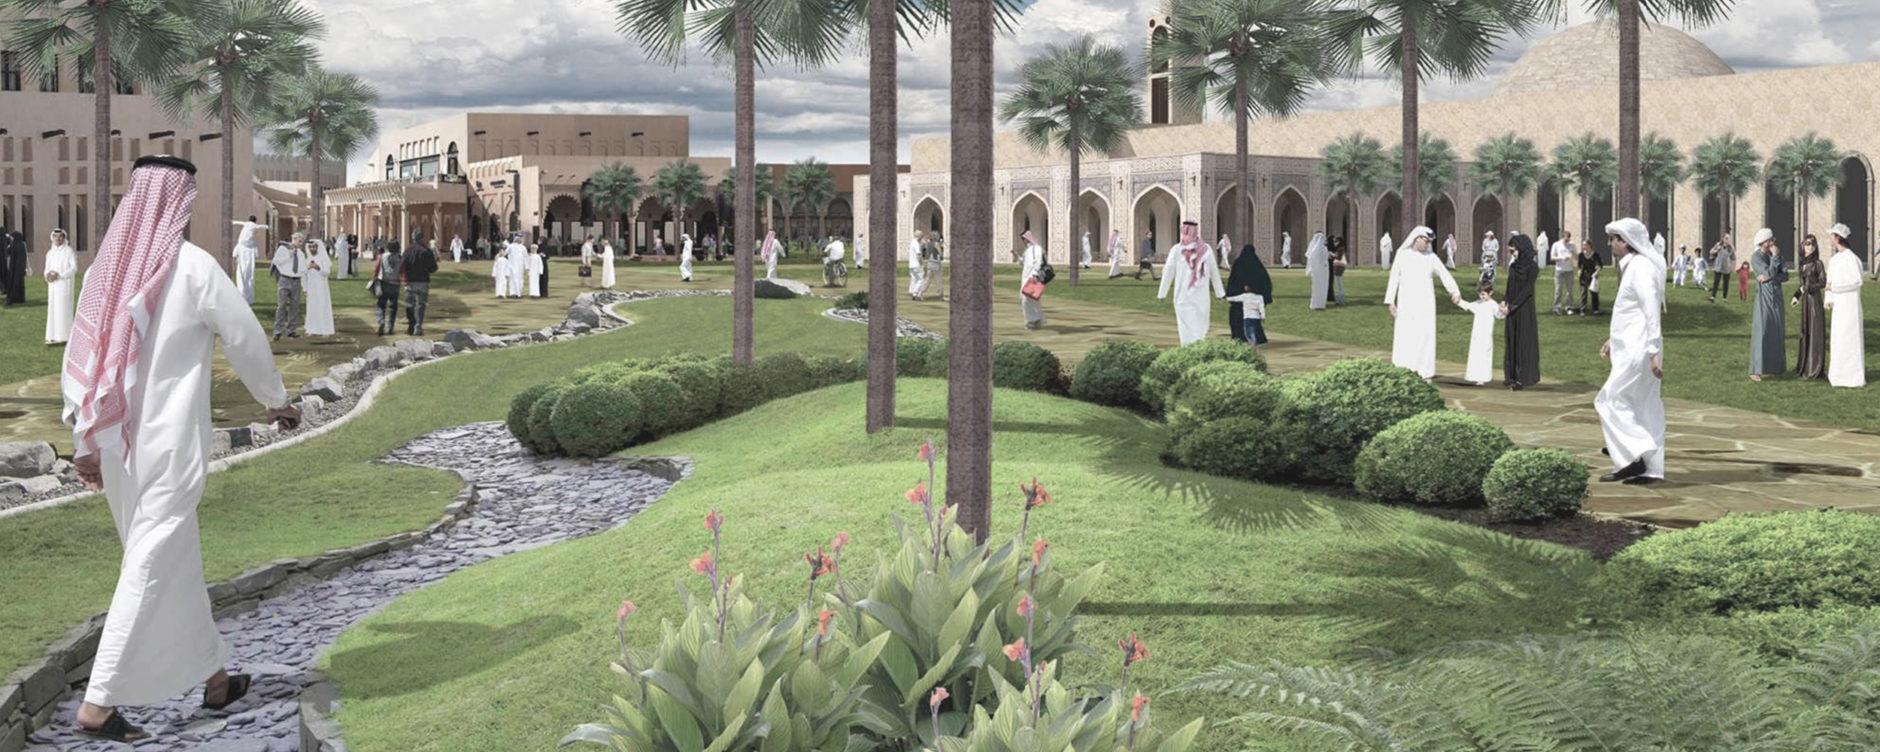 Doha Green belt scenarios, Albandari Alharami, Heba AlGuhani, Hessa Al Hajri, Maryam Abbara, Qatar University. © Qatar University.